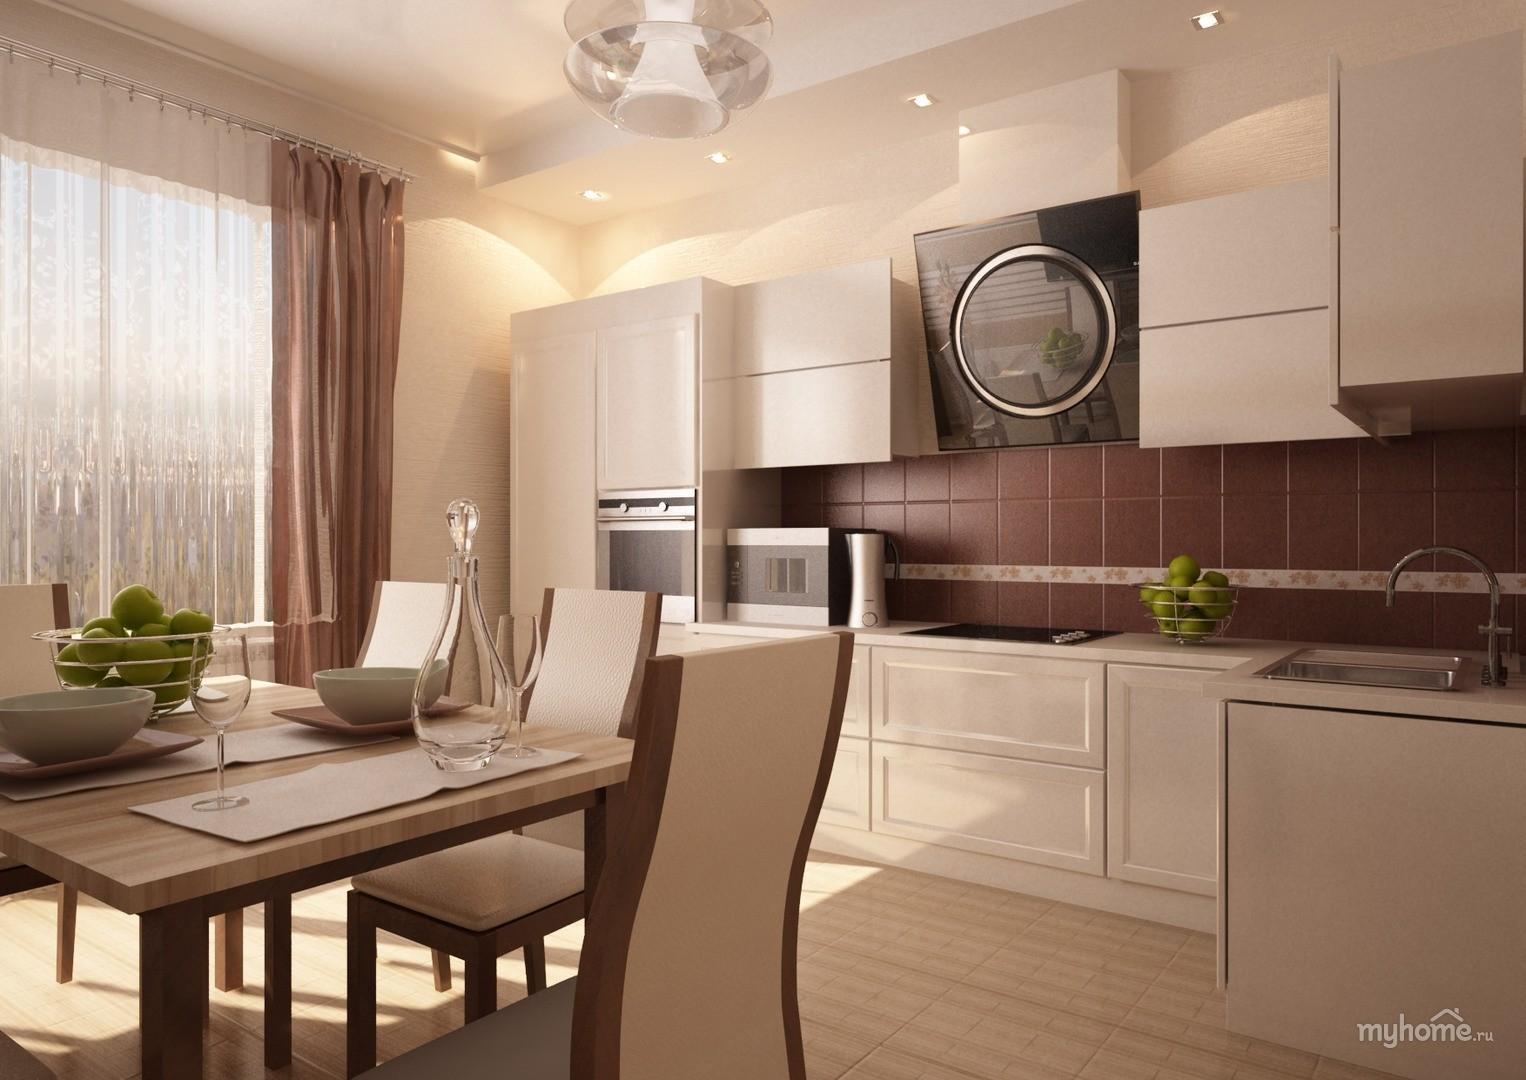 Дизайн кухни в бежевом цвете